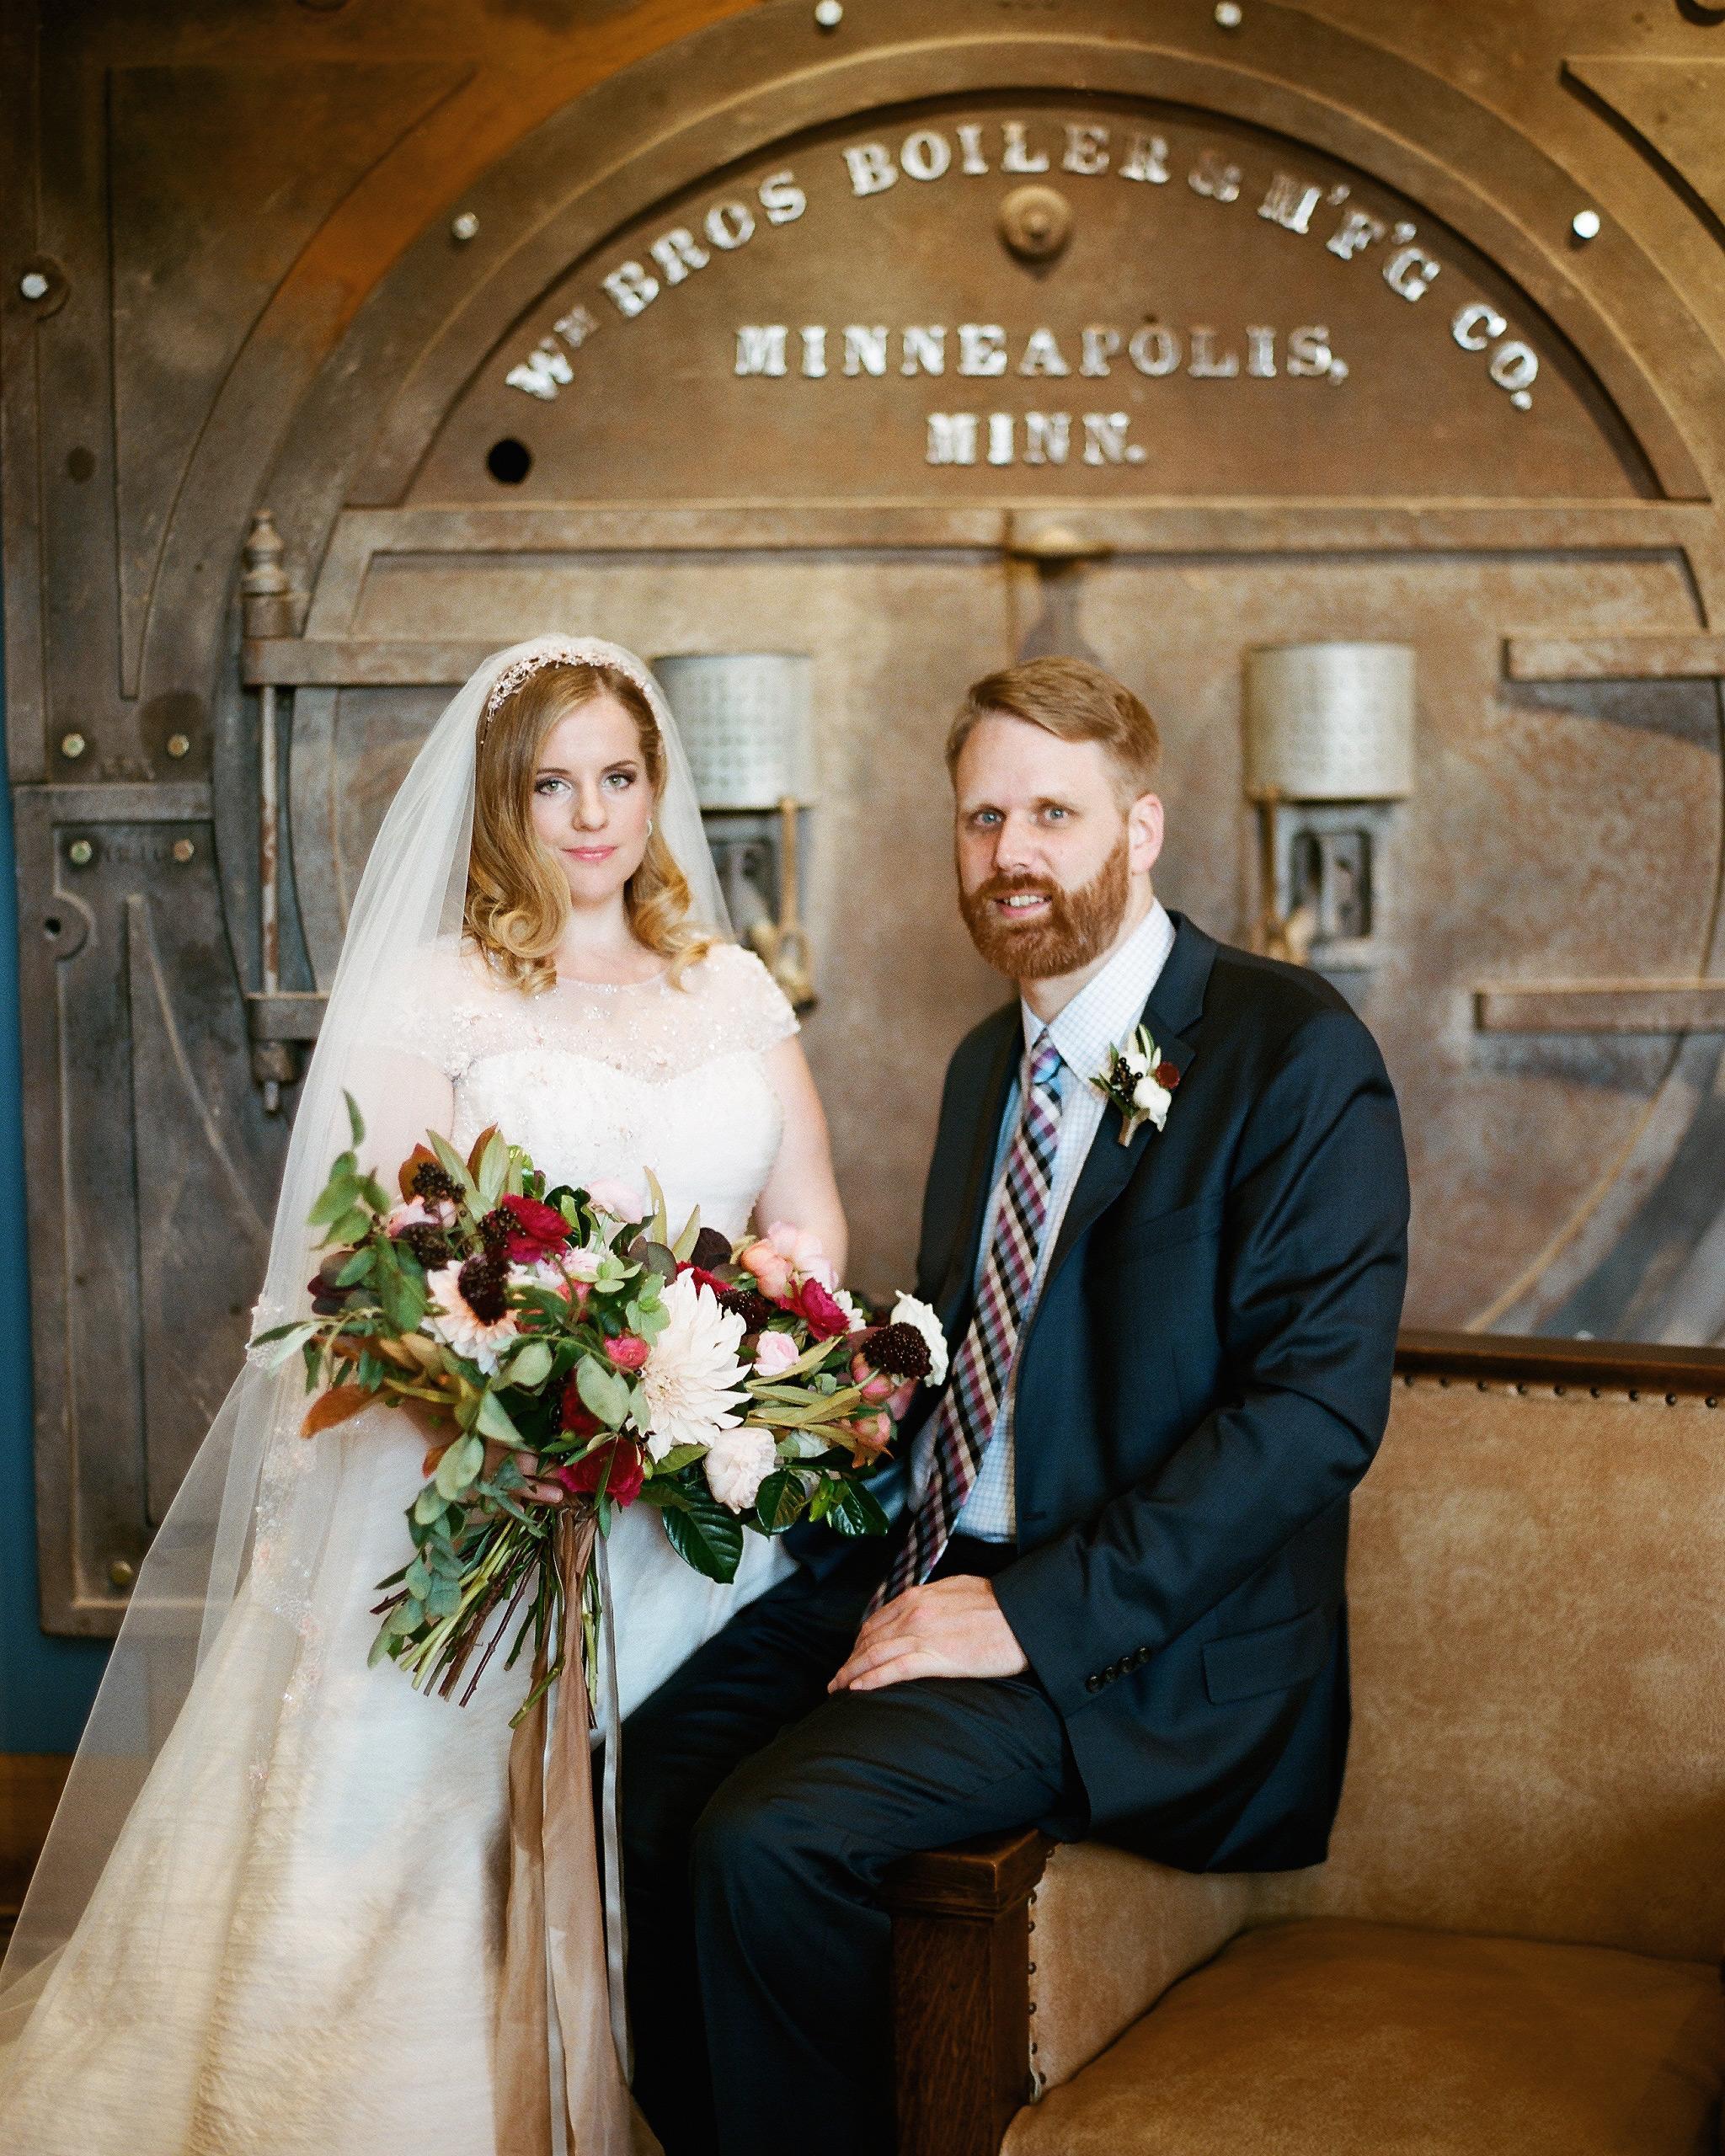 maddy-mike-wedding-couple-196.9739.13.2015.49-6134174-0716.jpg